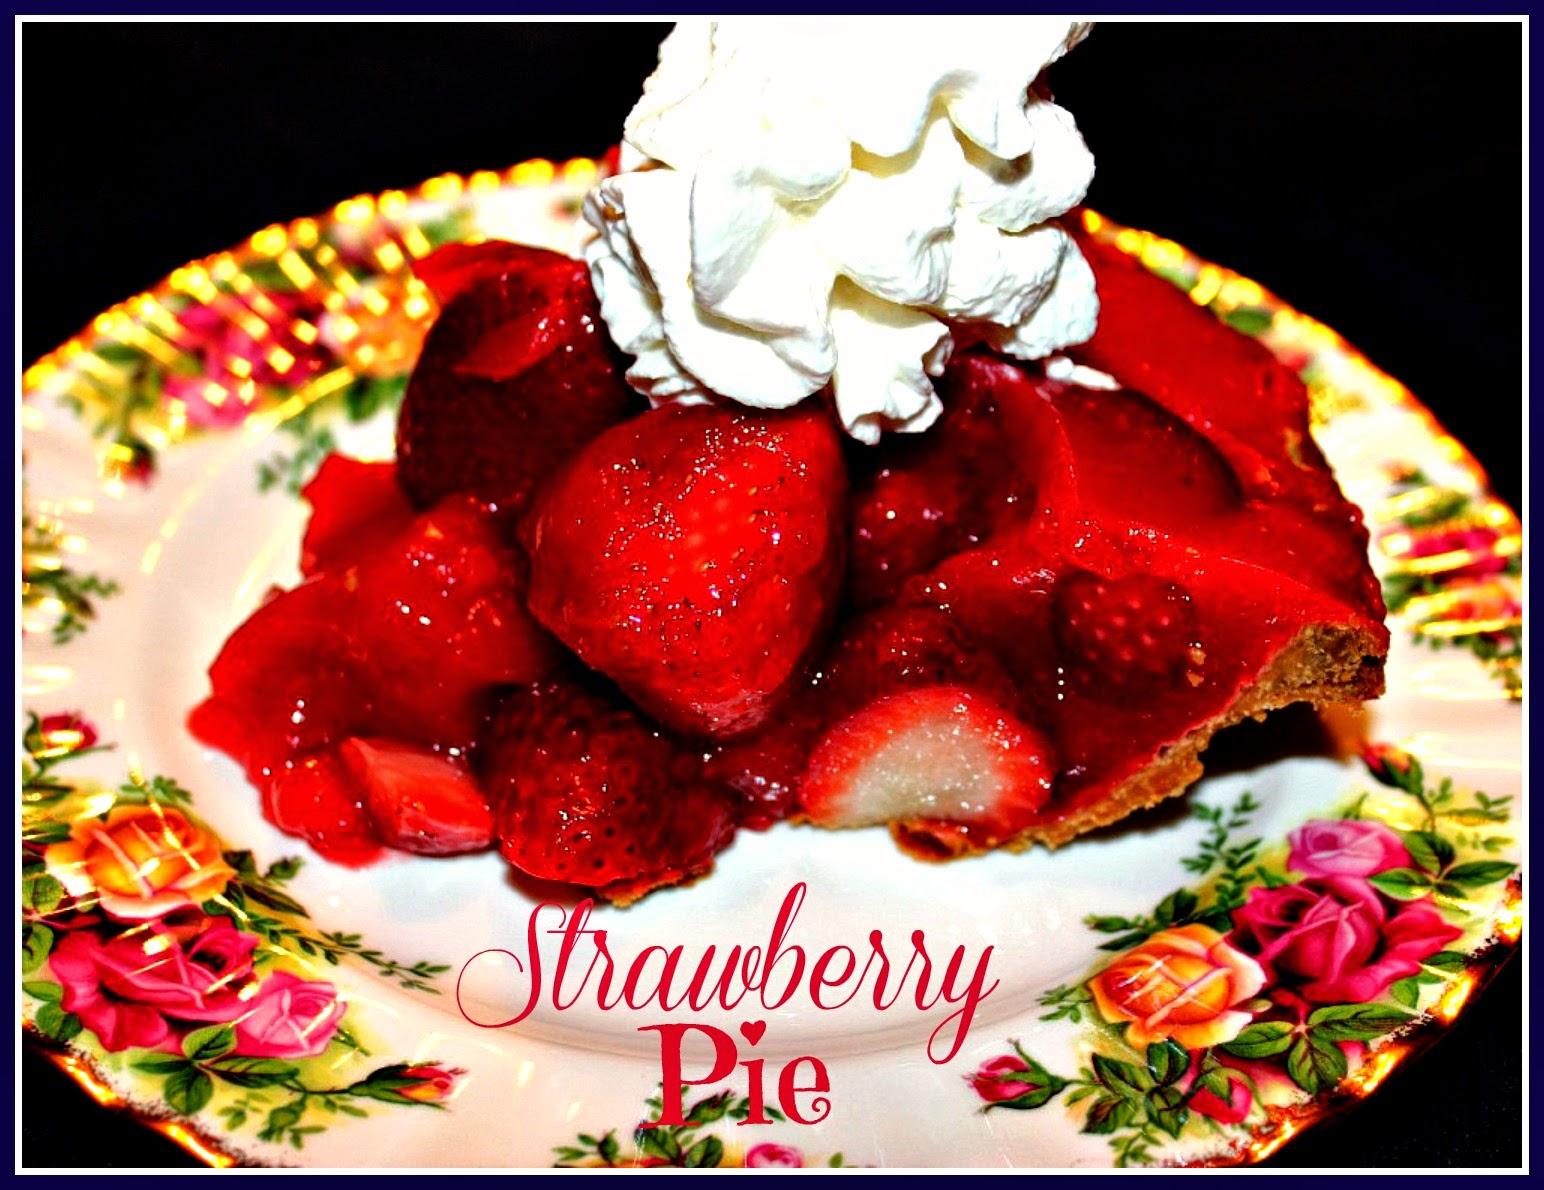 Sweet Tea and Cornbread: Fresh Strawberry Pie!